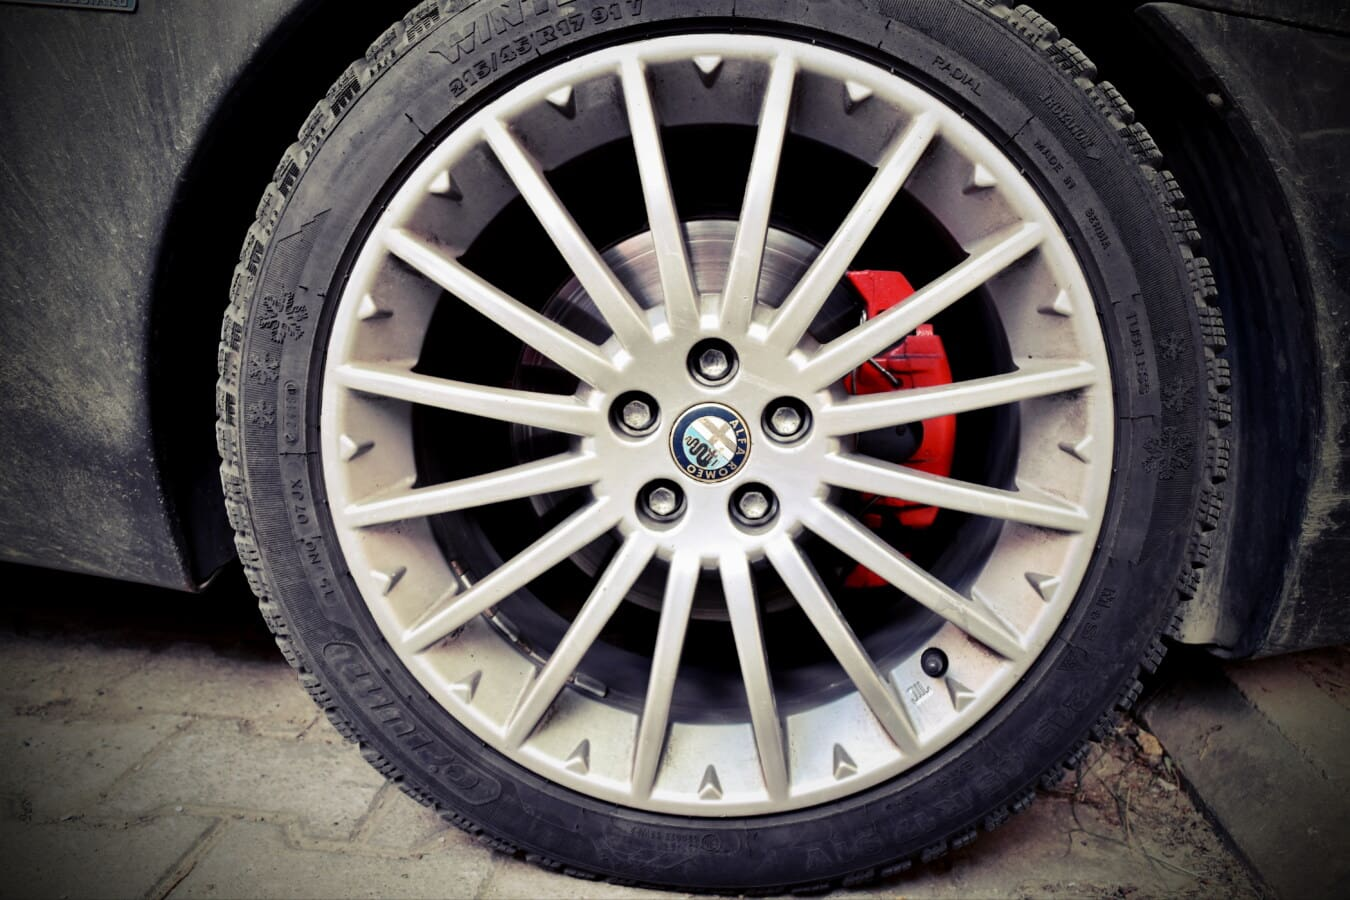 Alfa Romeo, dæk, sportsvogn, radial, rand, aluminium, maskine, bil, hjulet, autojen